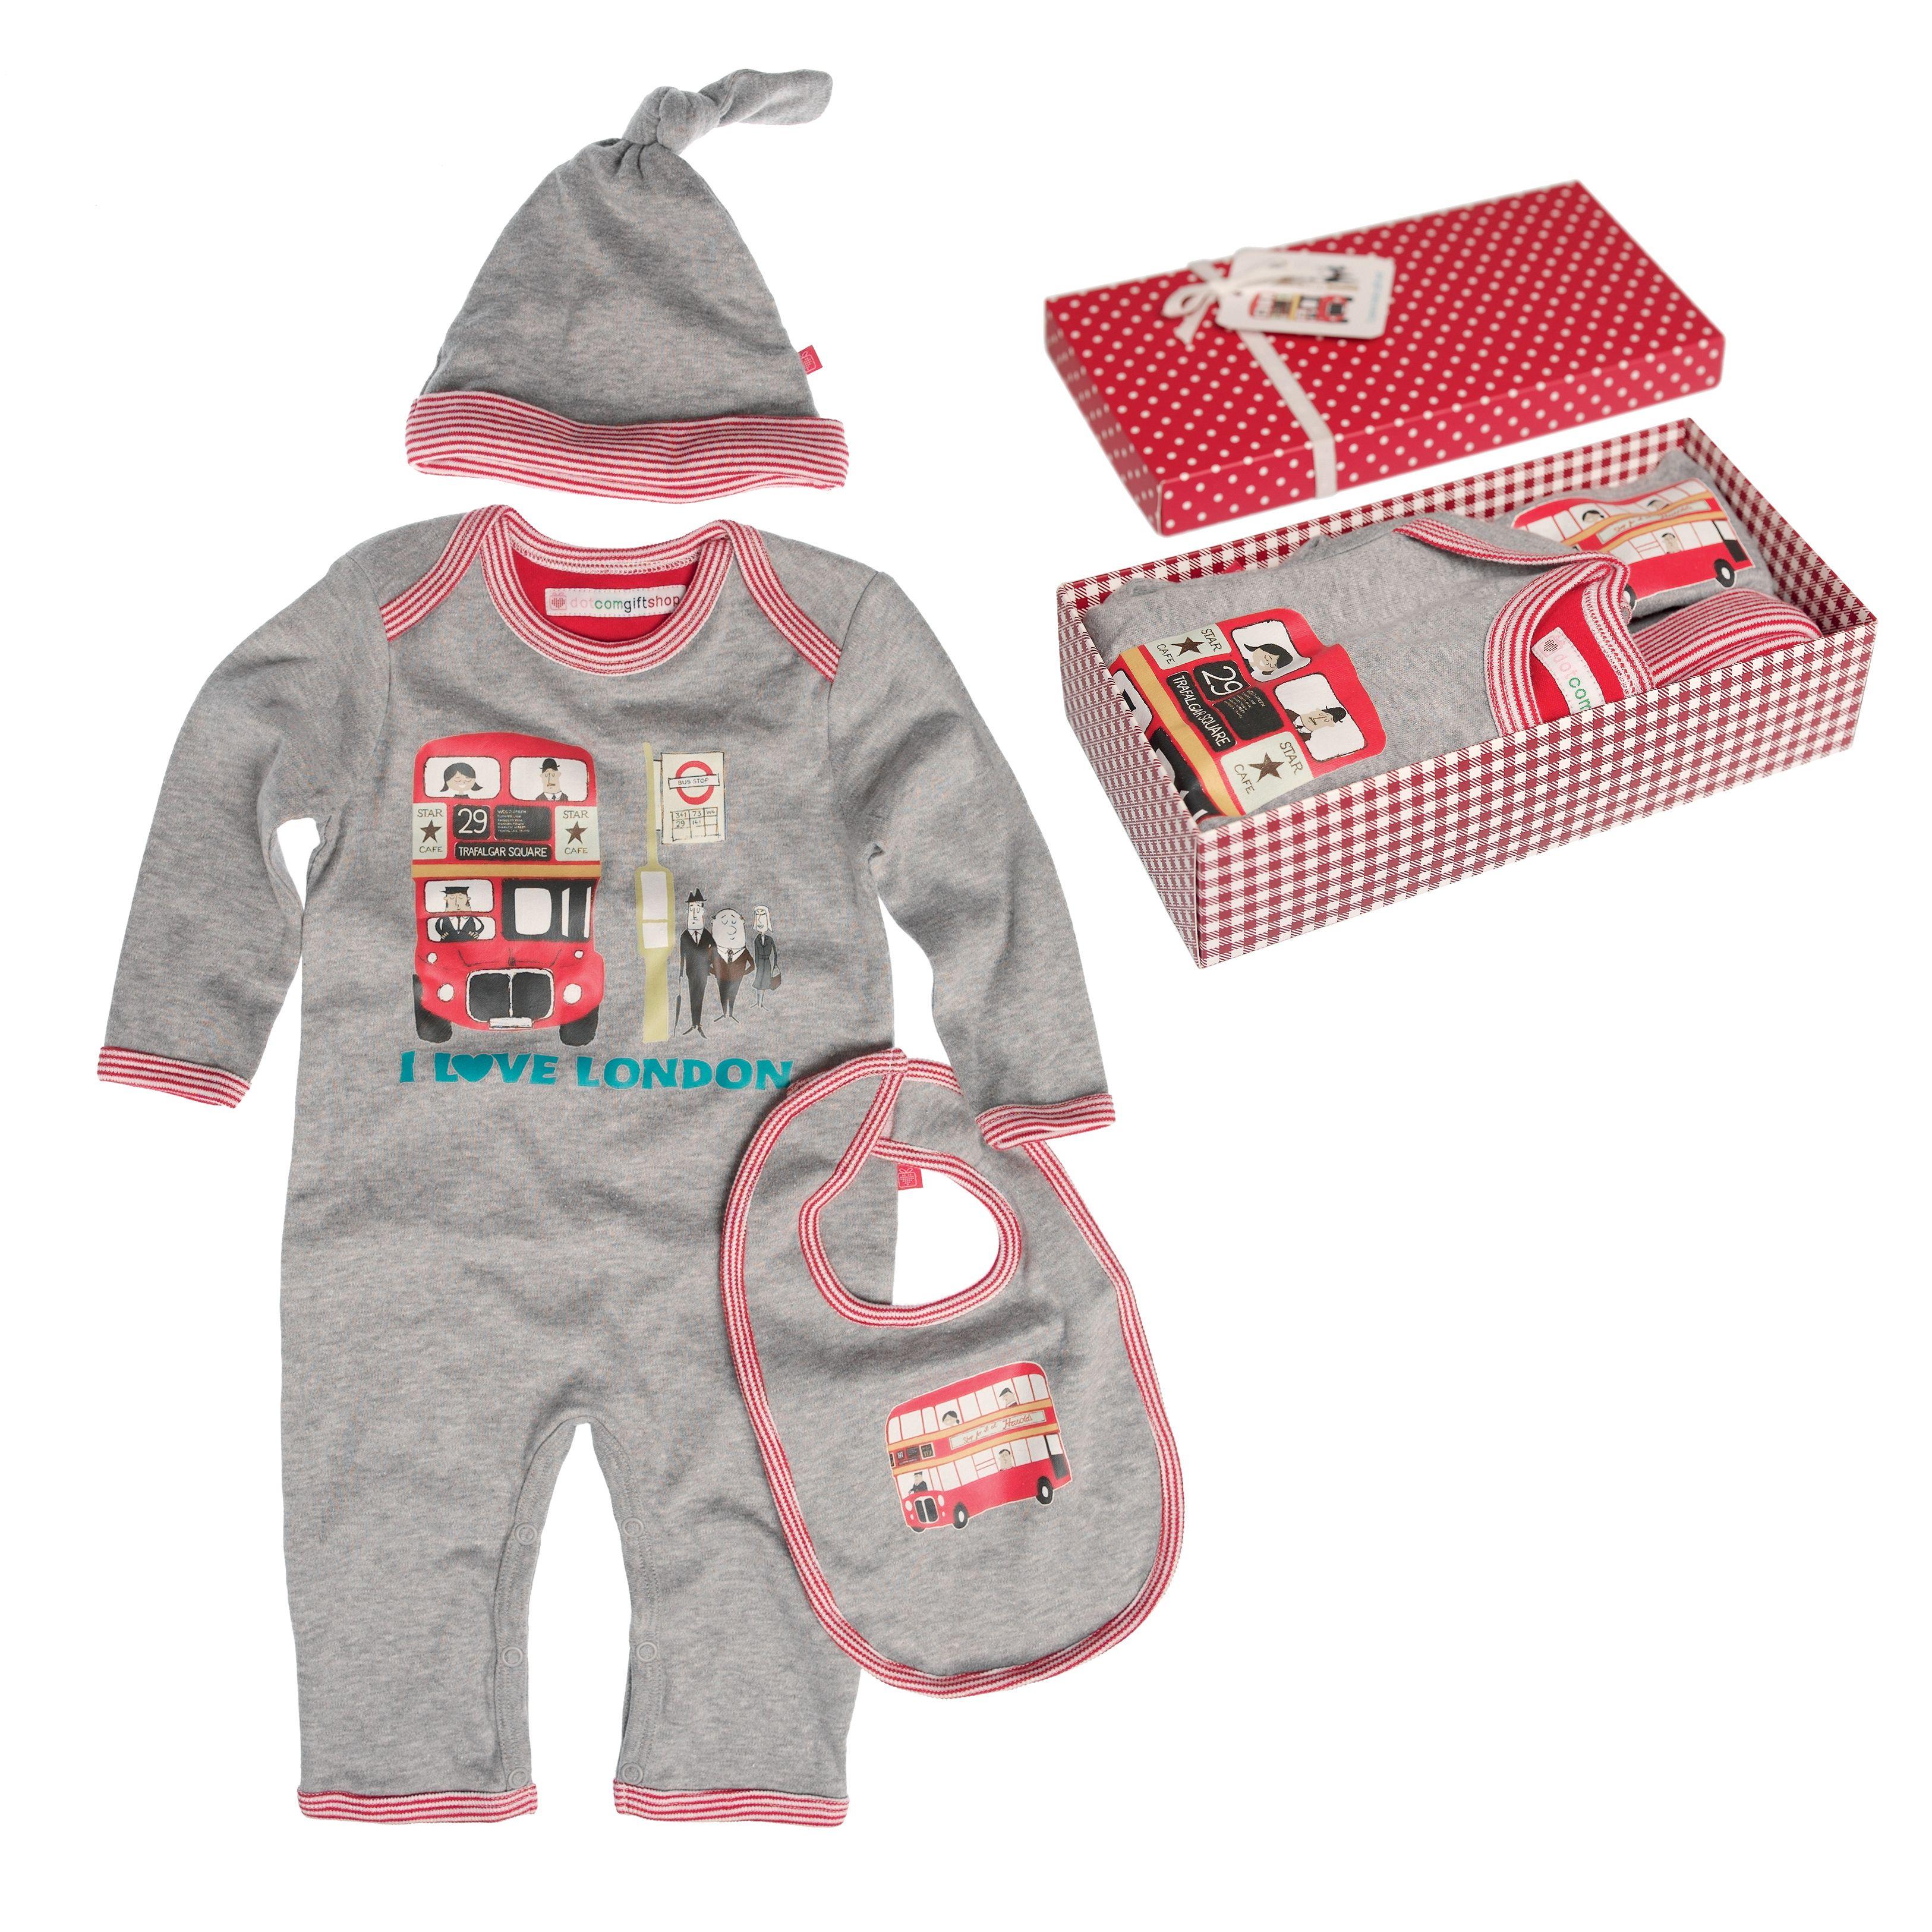 I Love London Boxed Baby Gift Set